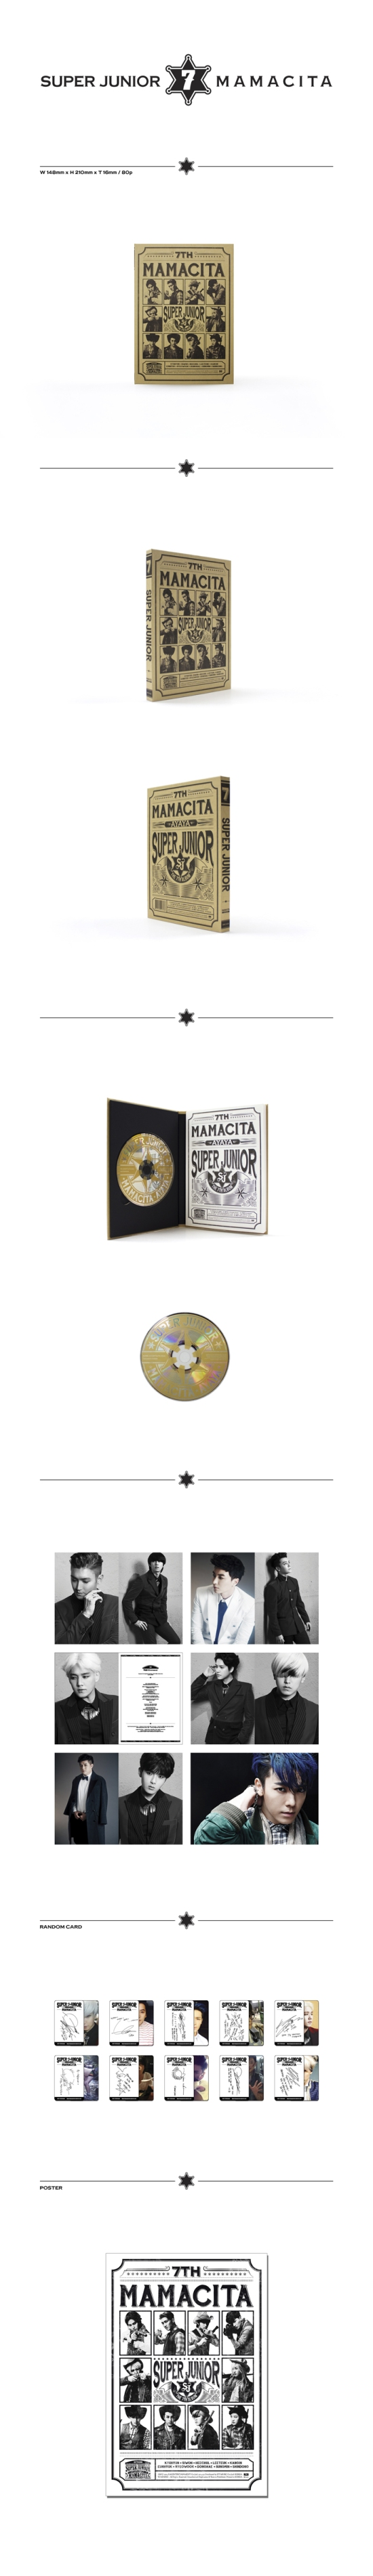 140.903 Mamacita versione b